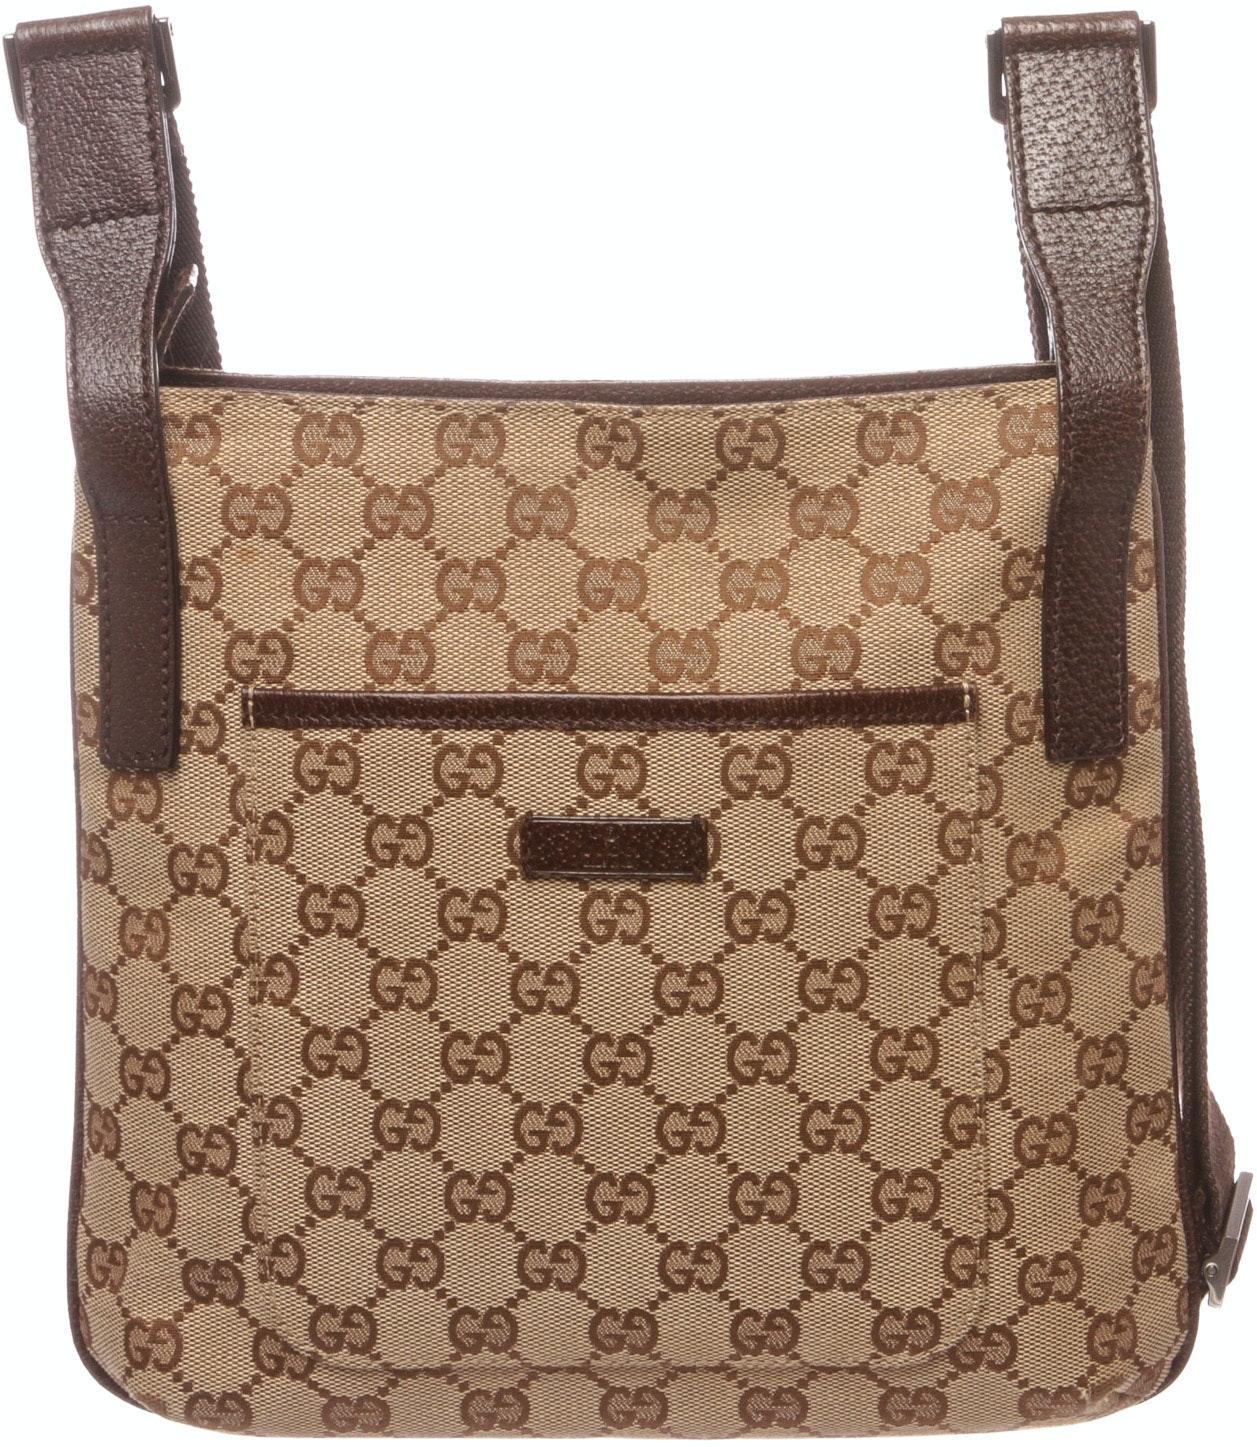 Gucci Crossbody Monogram GG Beige/Brown